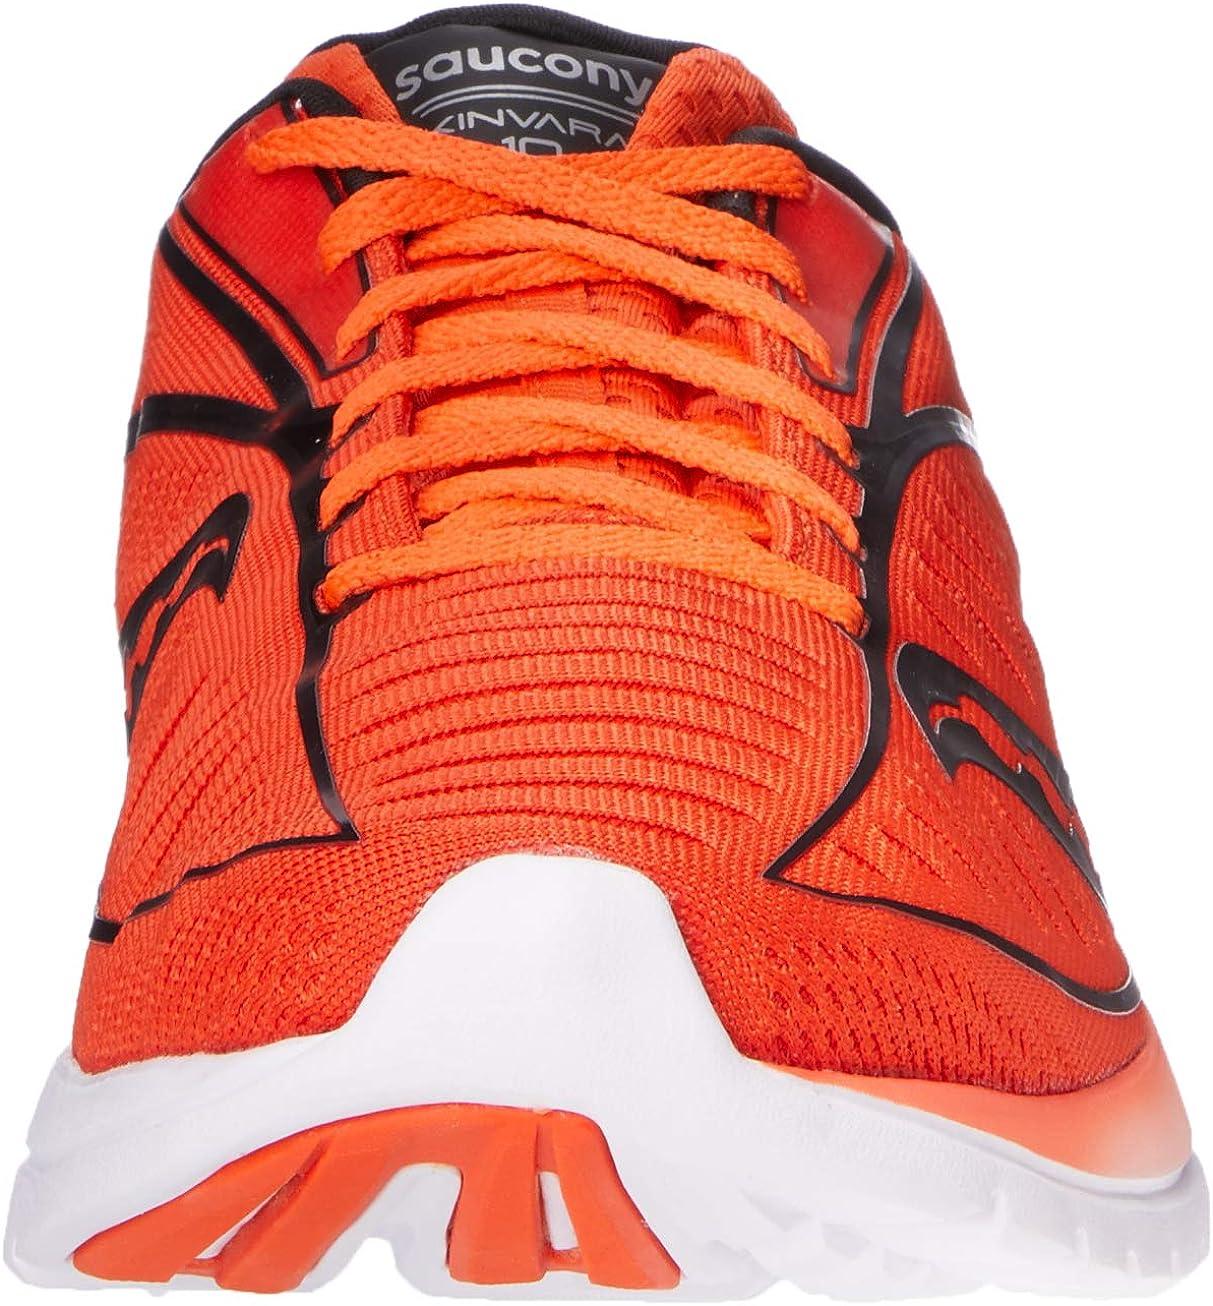 mens mizuno running shoes size 9.5 en espa�ol foro corpor